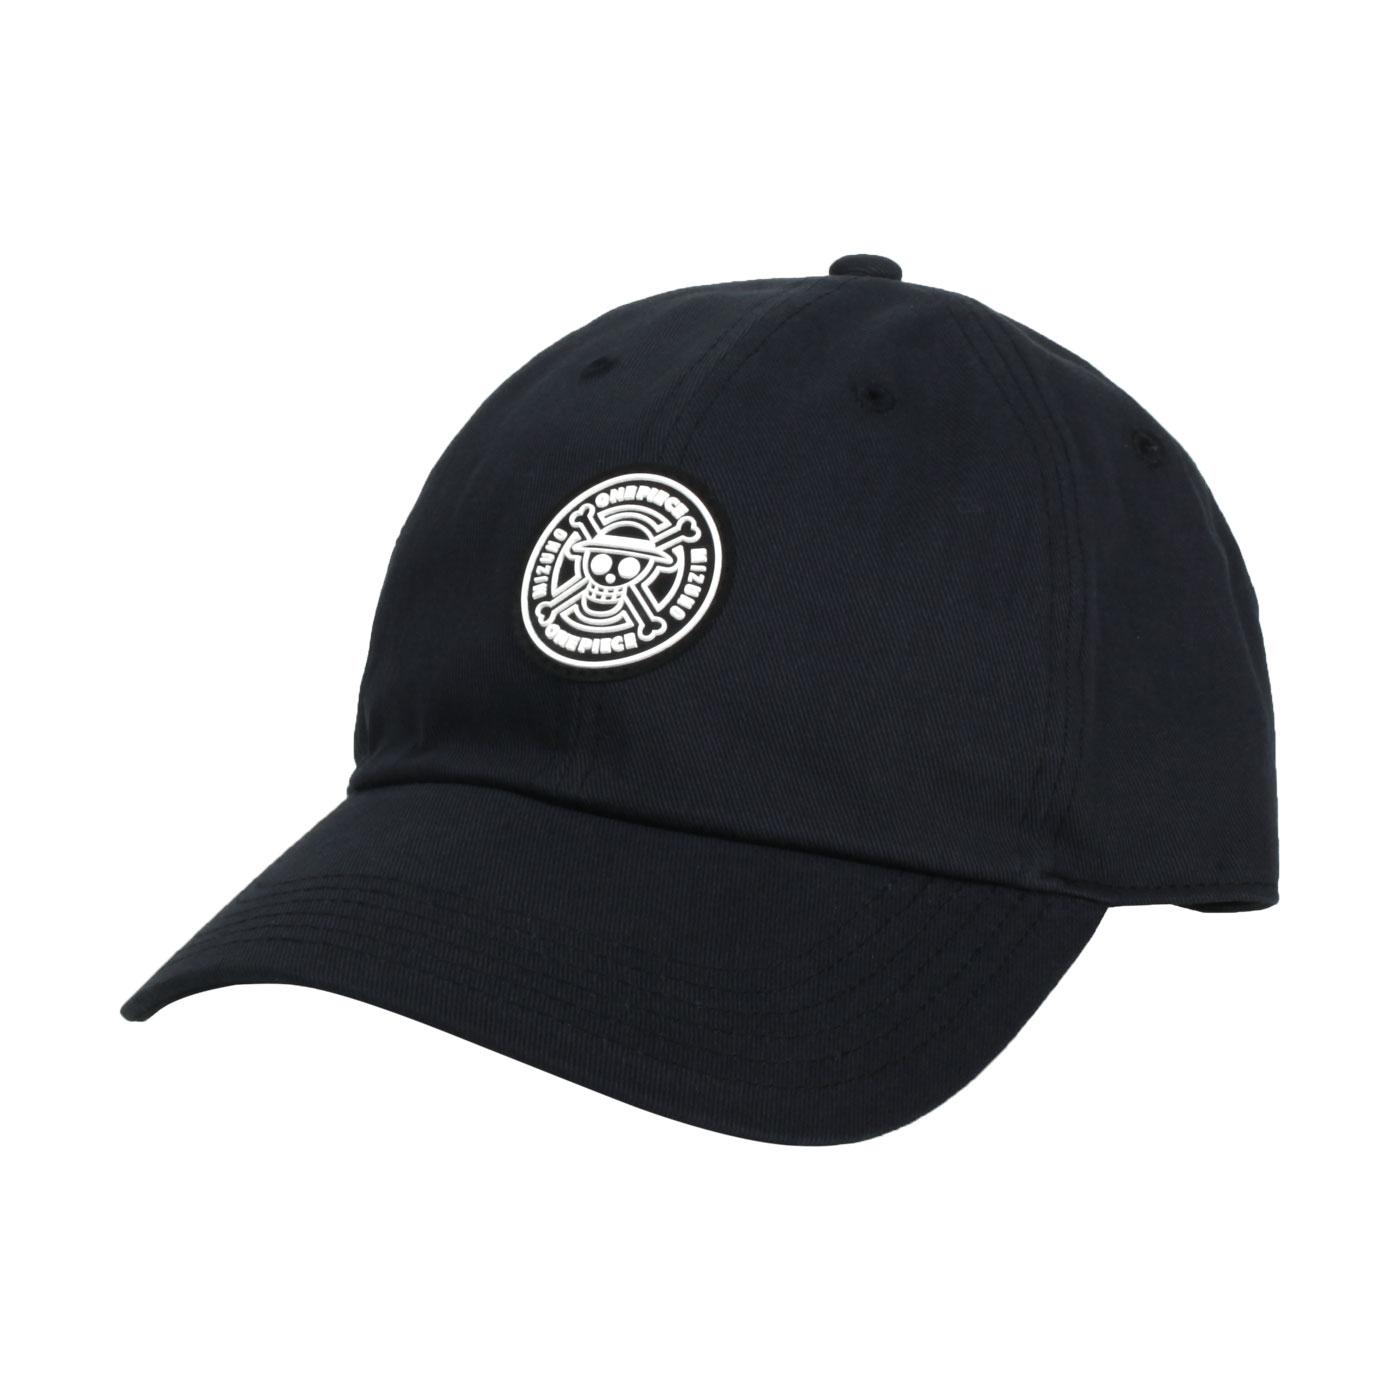 MIZUNO 特定-棉帽(海賊王聯名款) D2TW170209 - 黑白